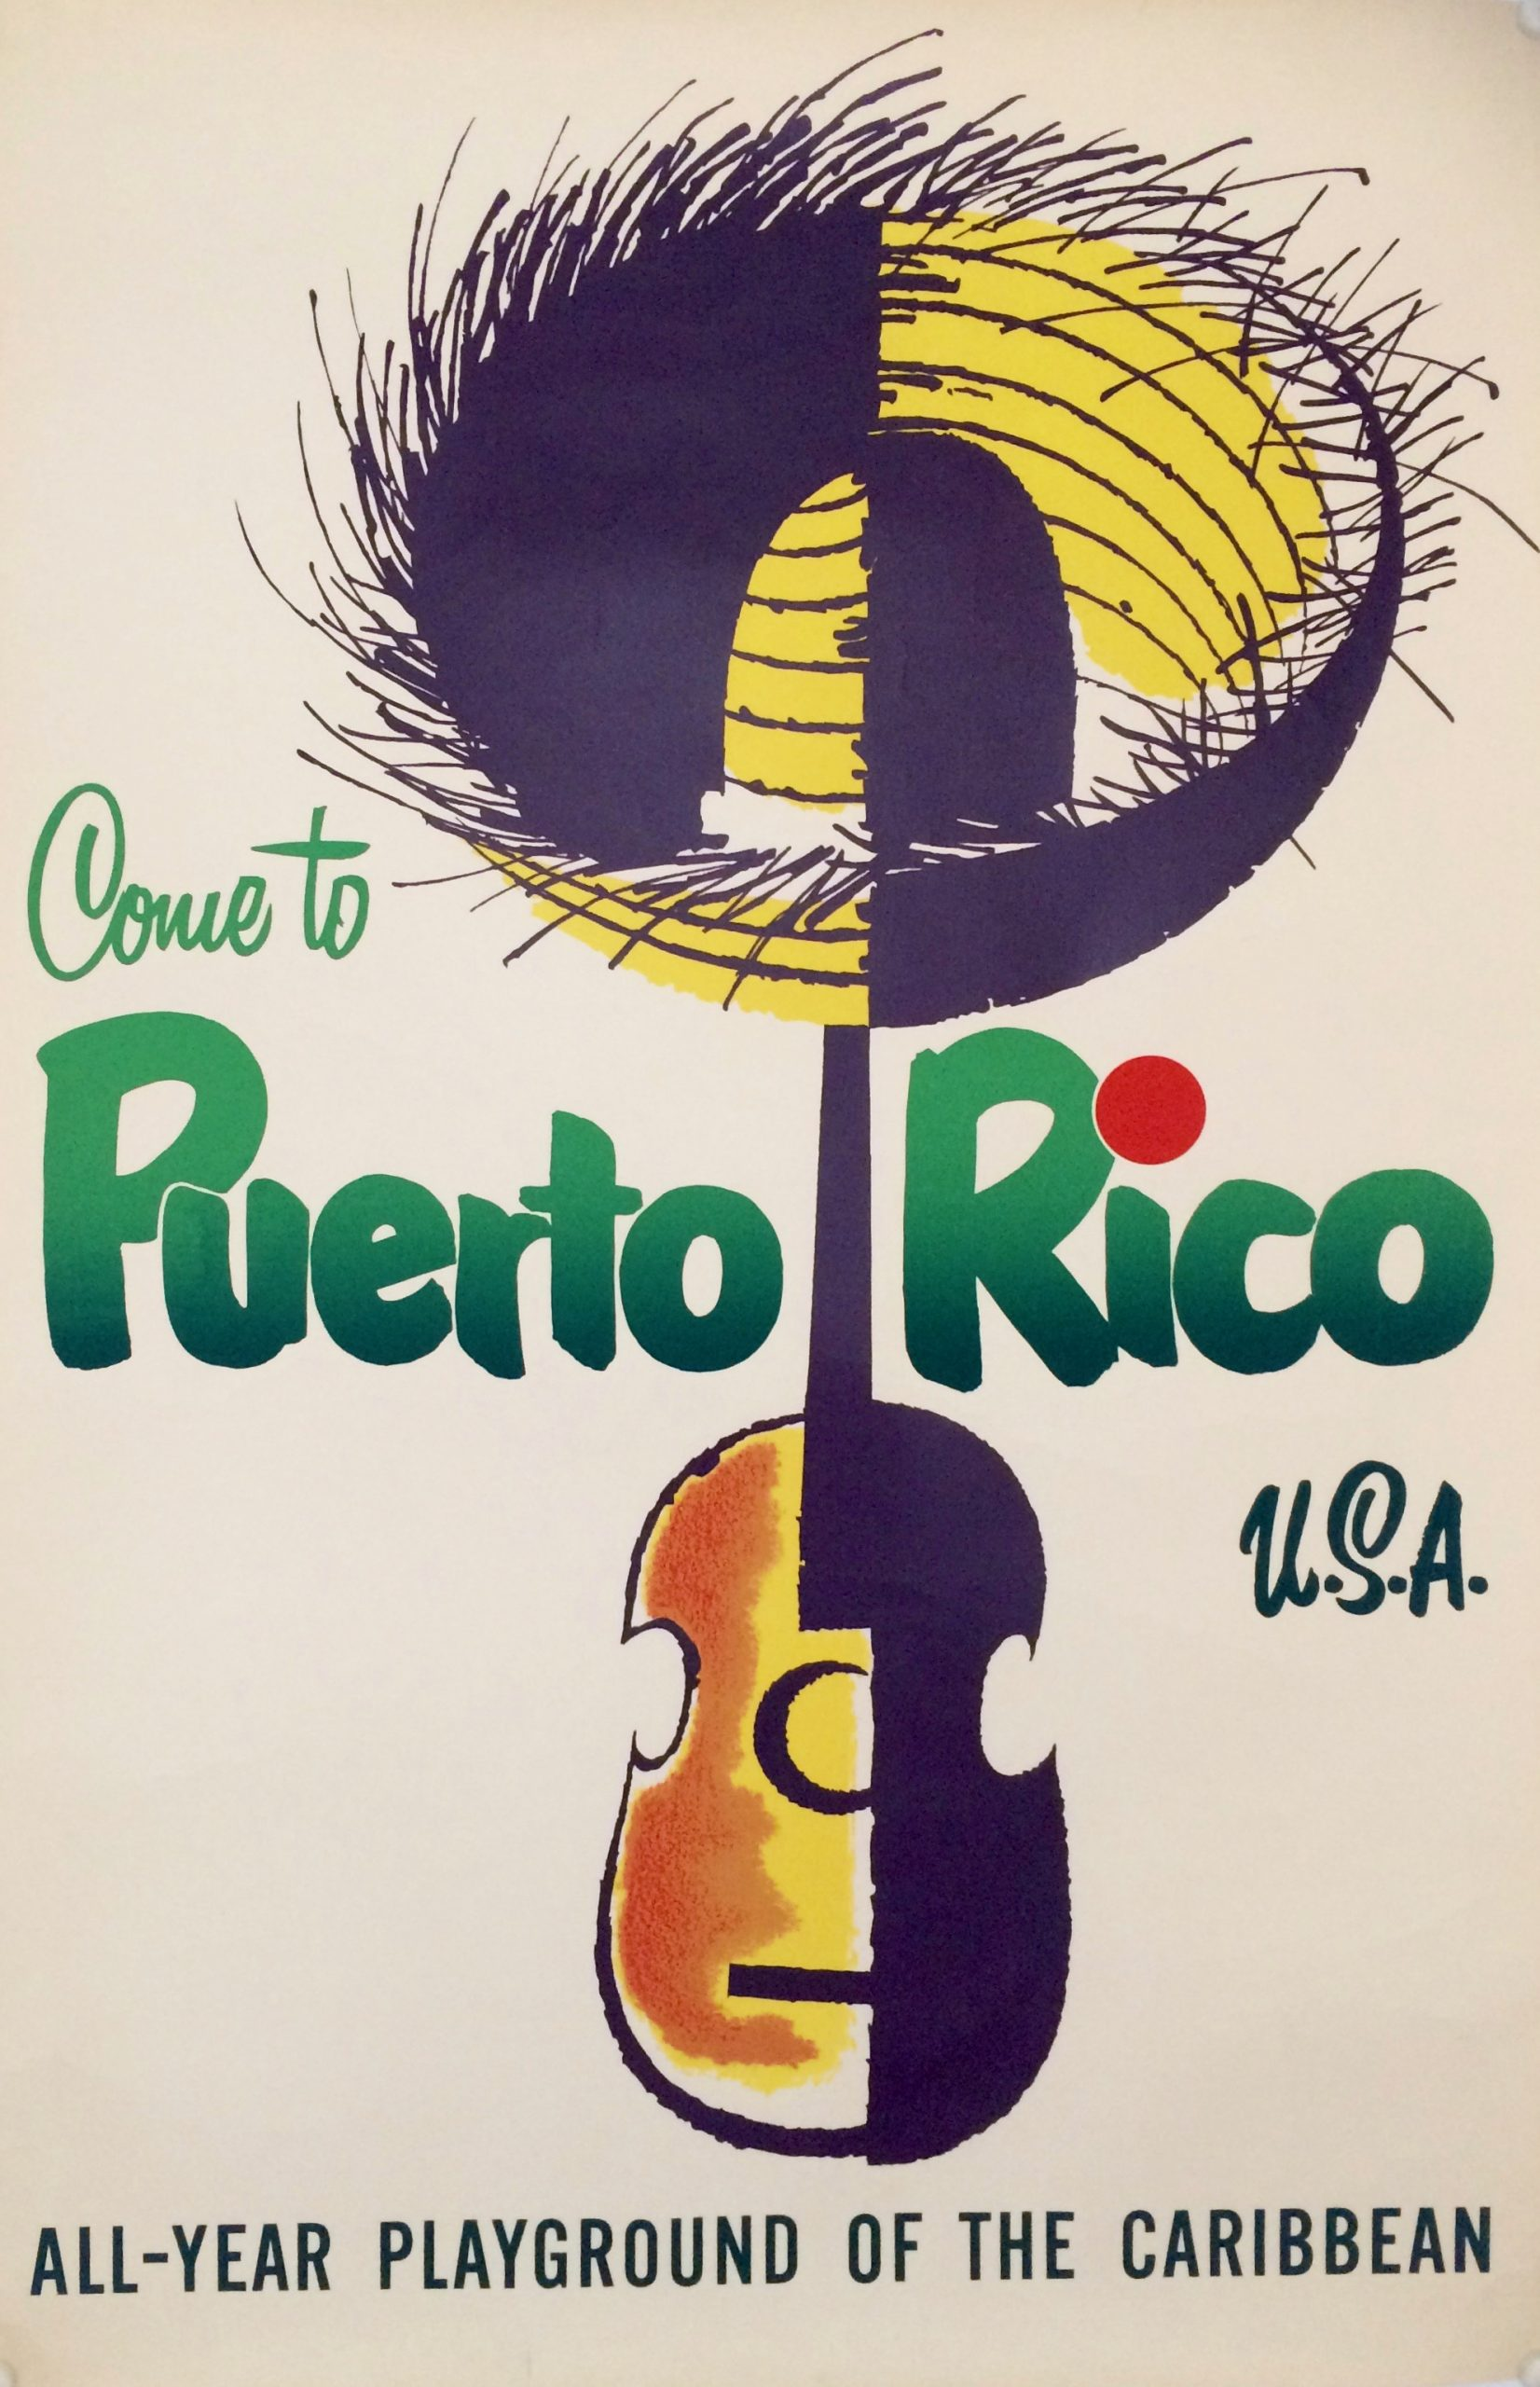 Come to Puerto Rico